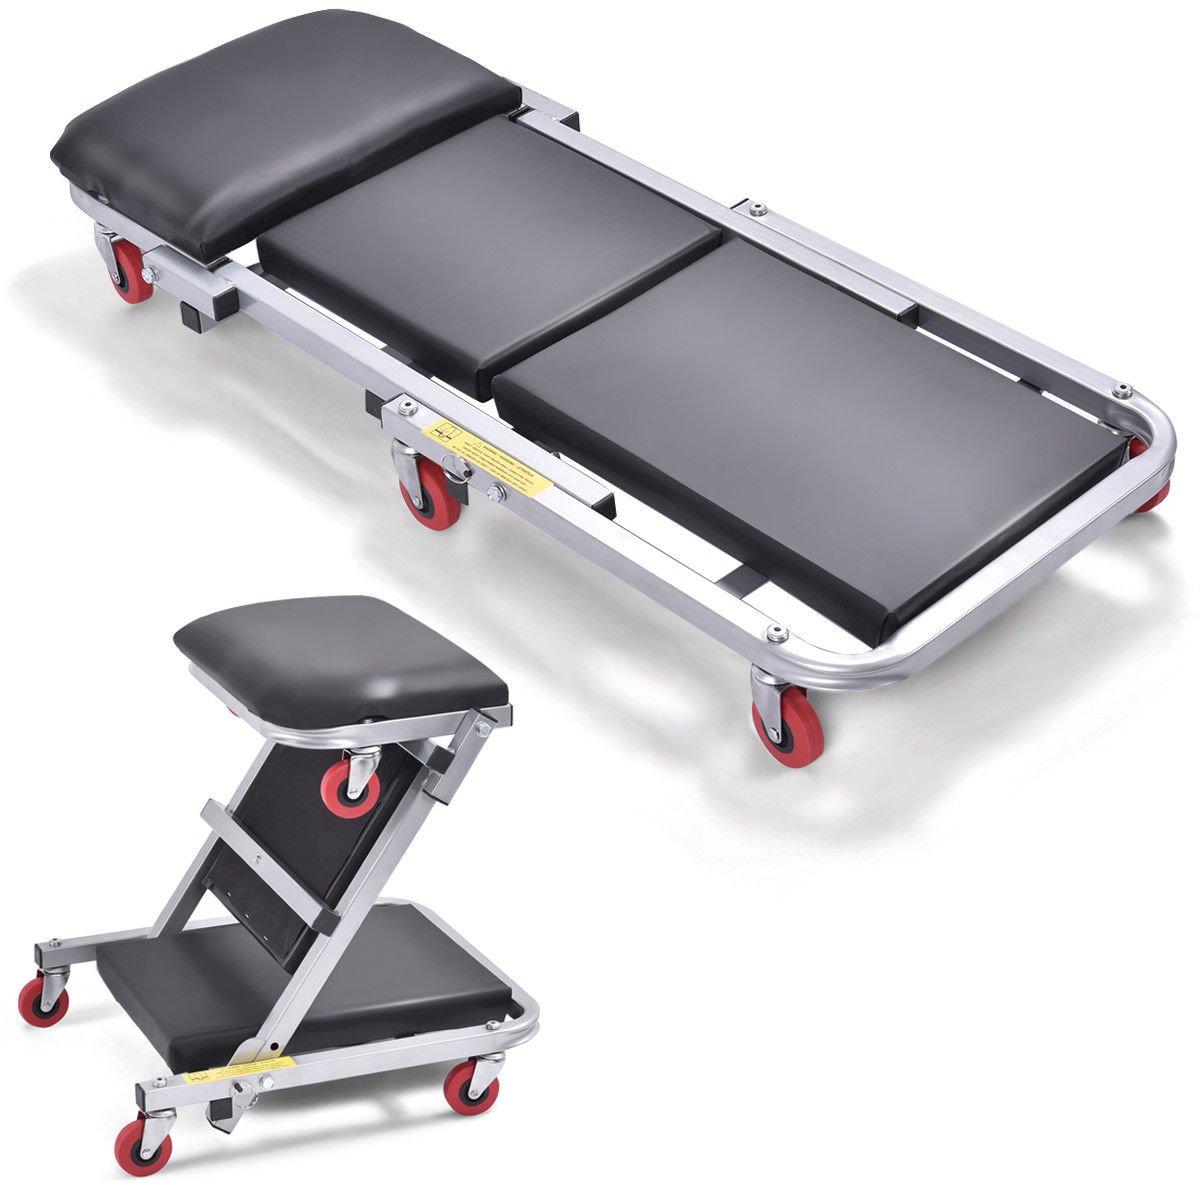 Goplus 40'' Foldable Z Creeper Seat Rolling Chair Mechanics Garage 2 in 1 Work Stool